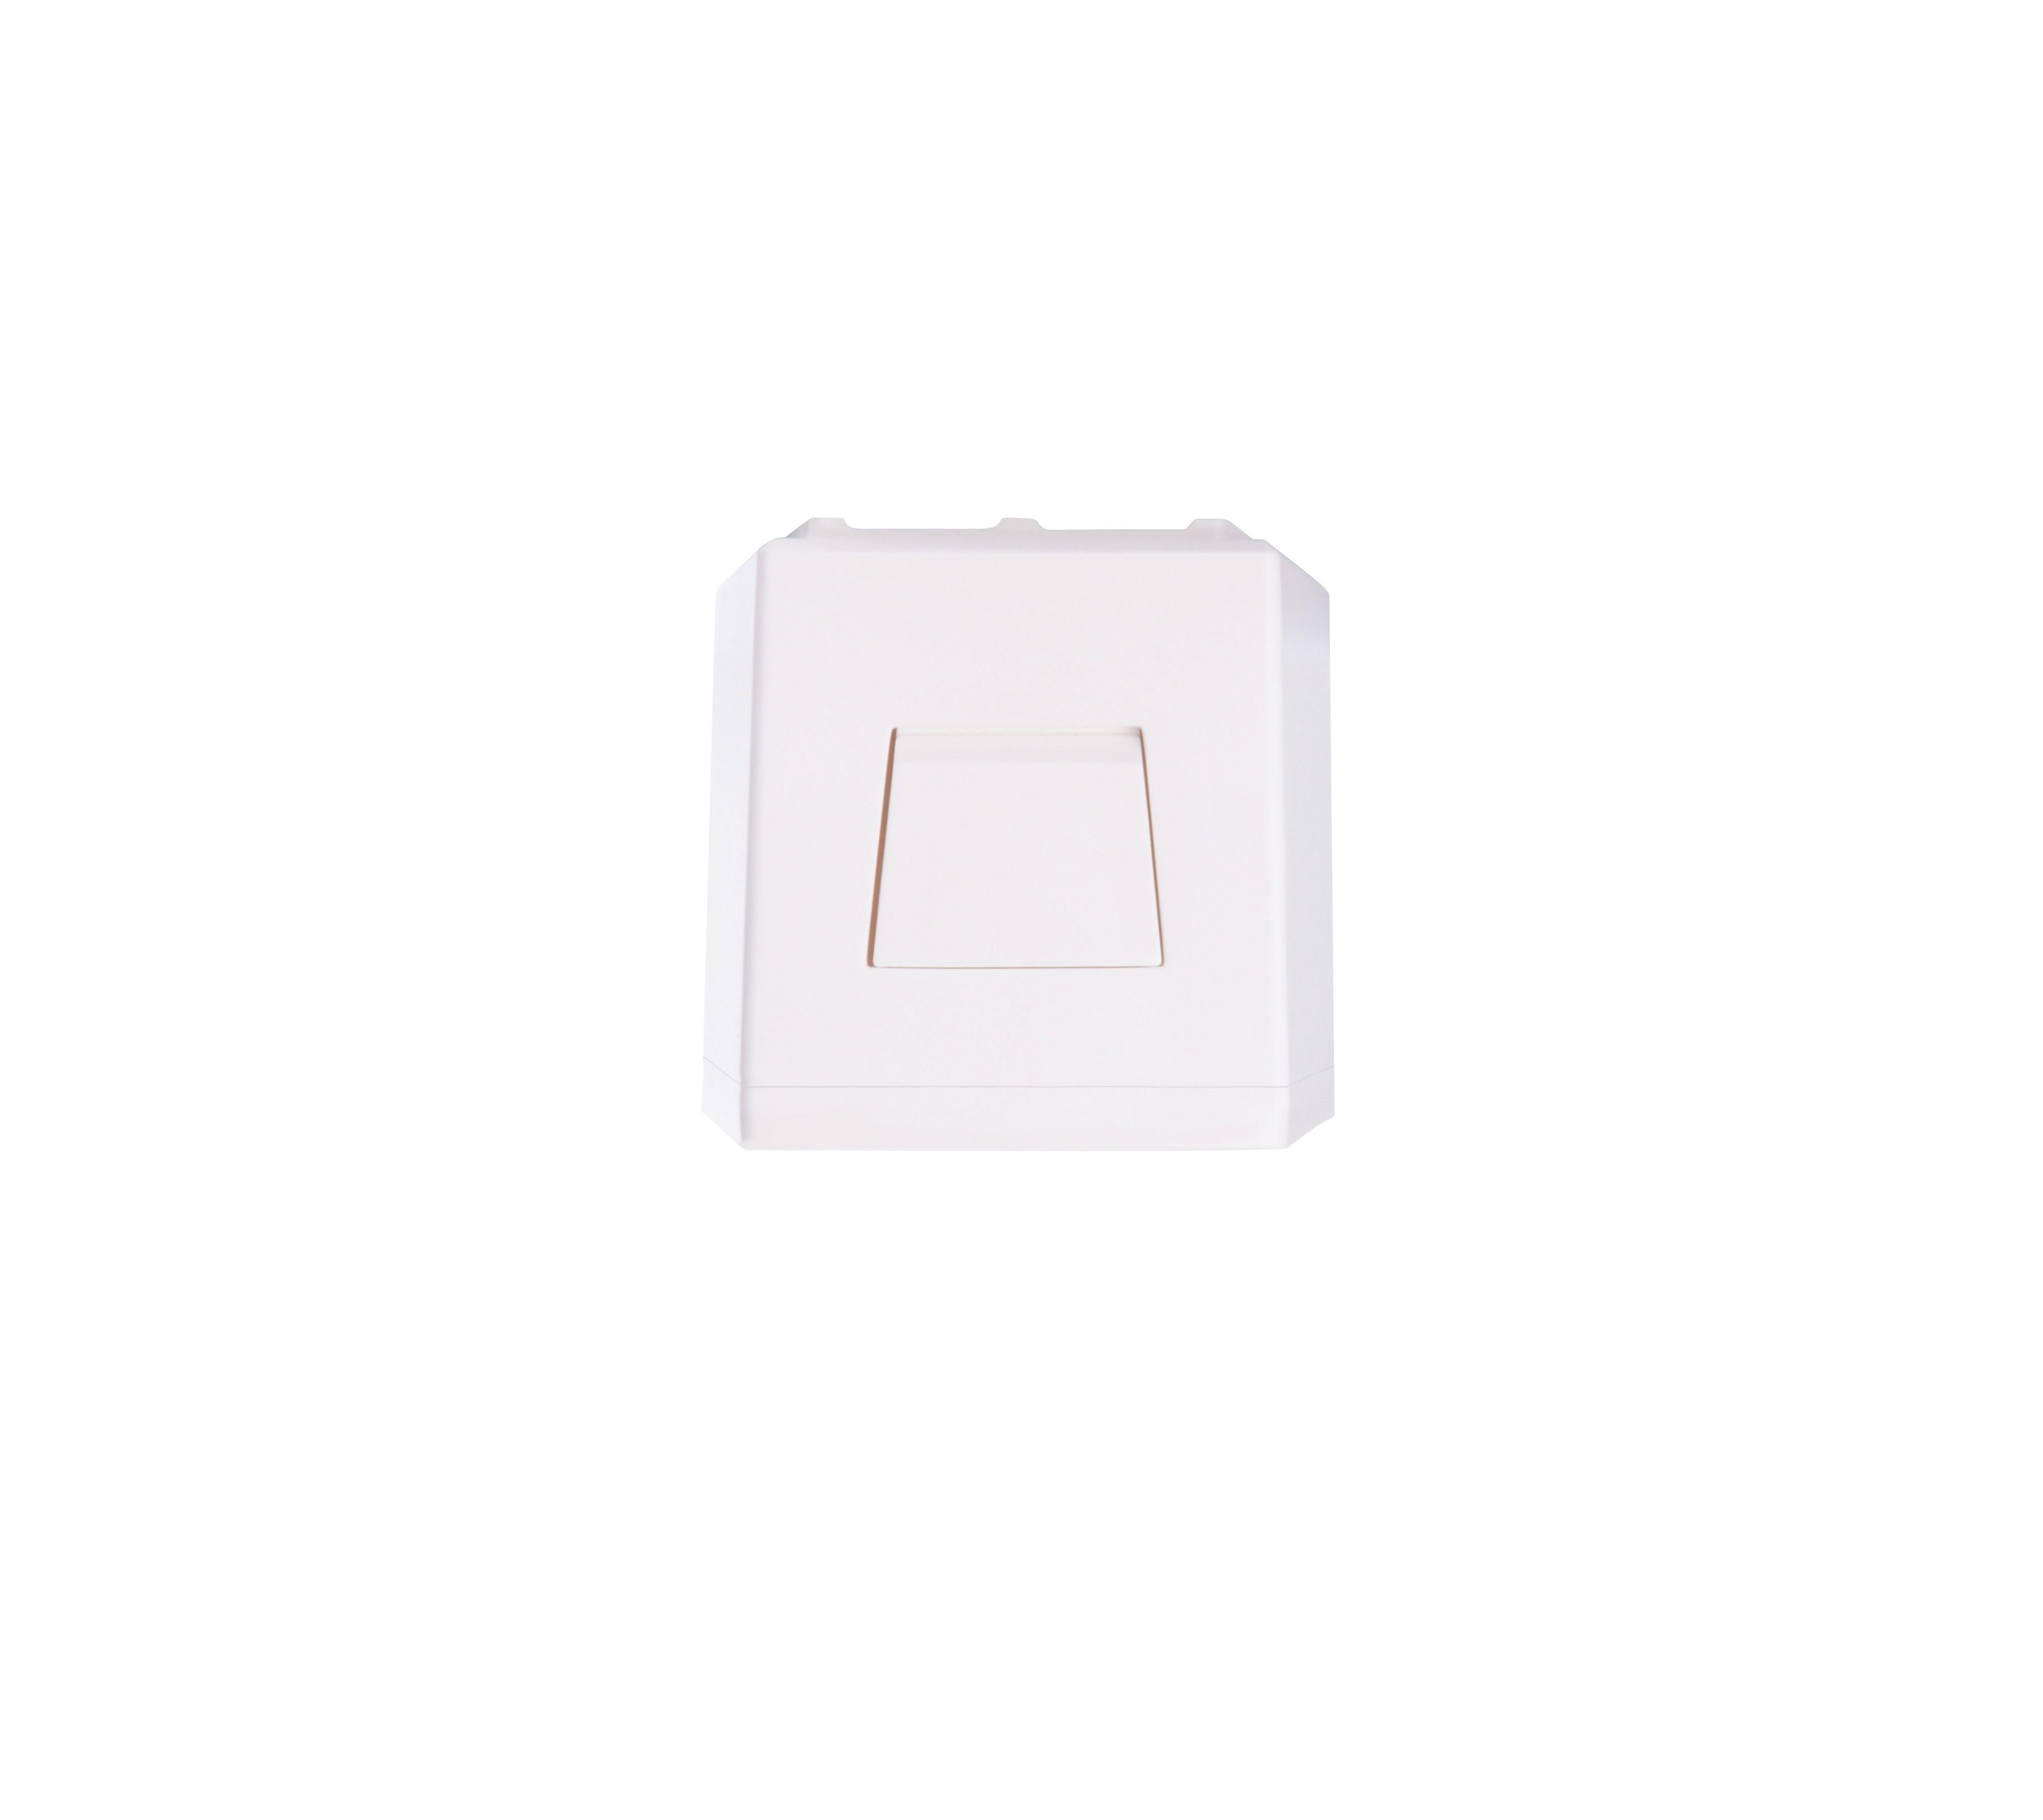 Lampa emergenta led Intelight 94658   3h mentinut test automat 1